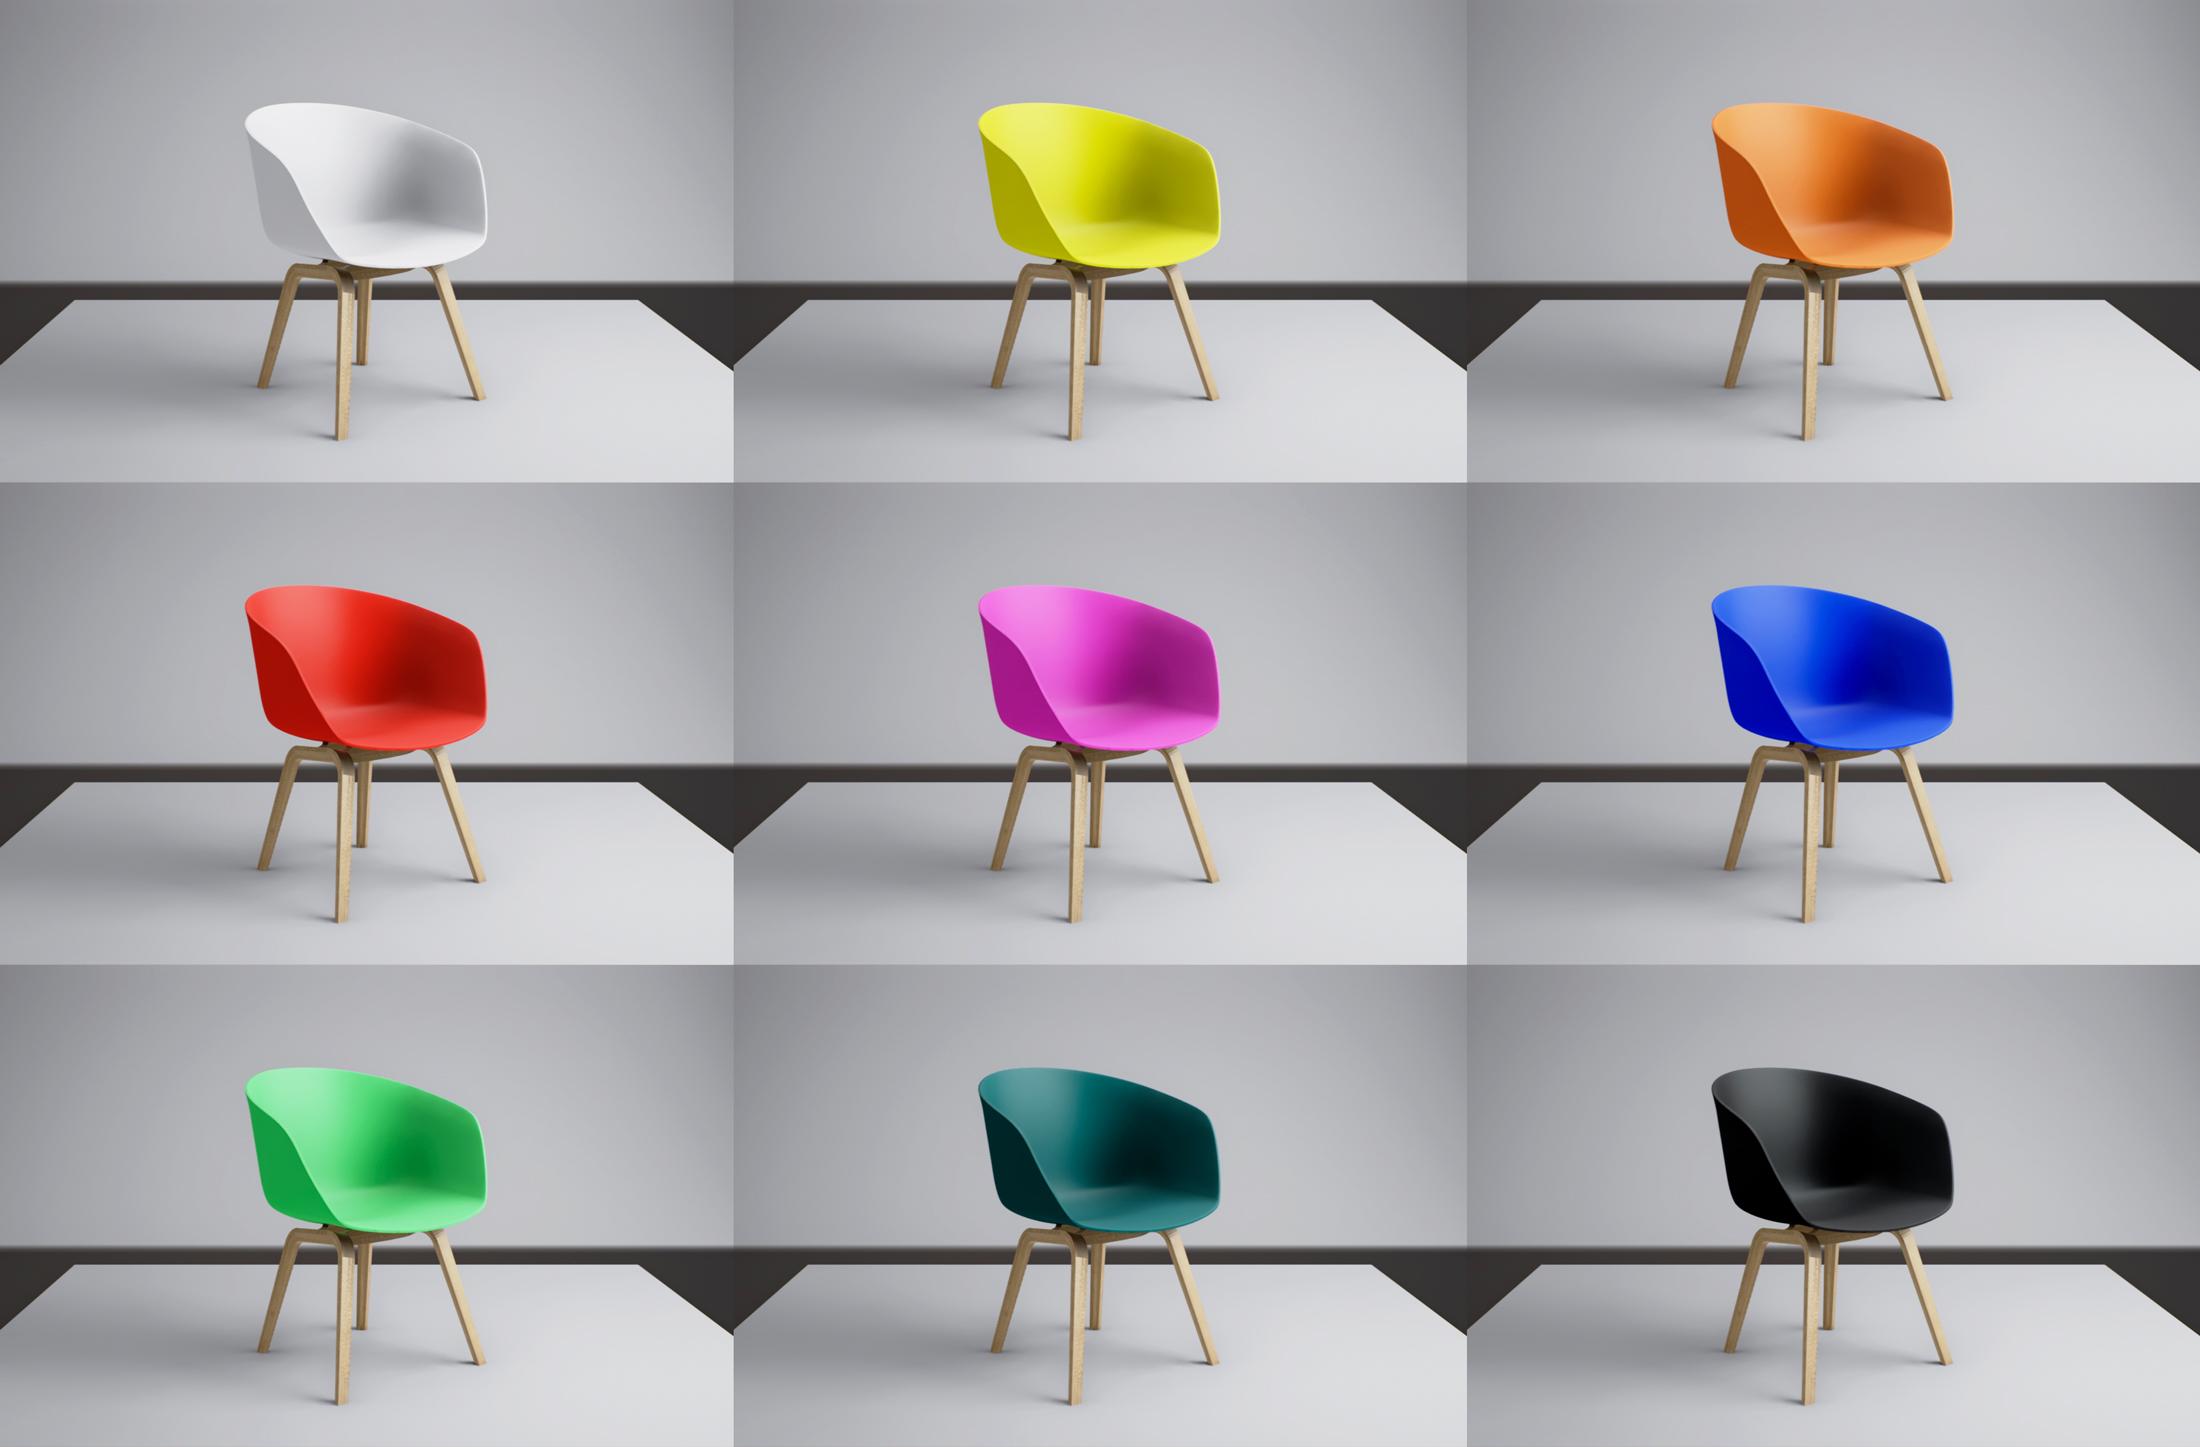 UE4_StudioLight_001_ChairColor